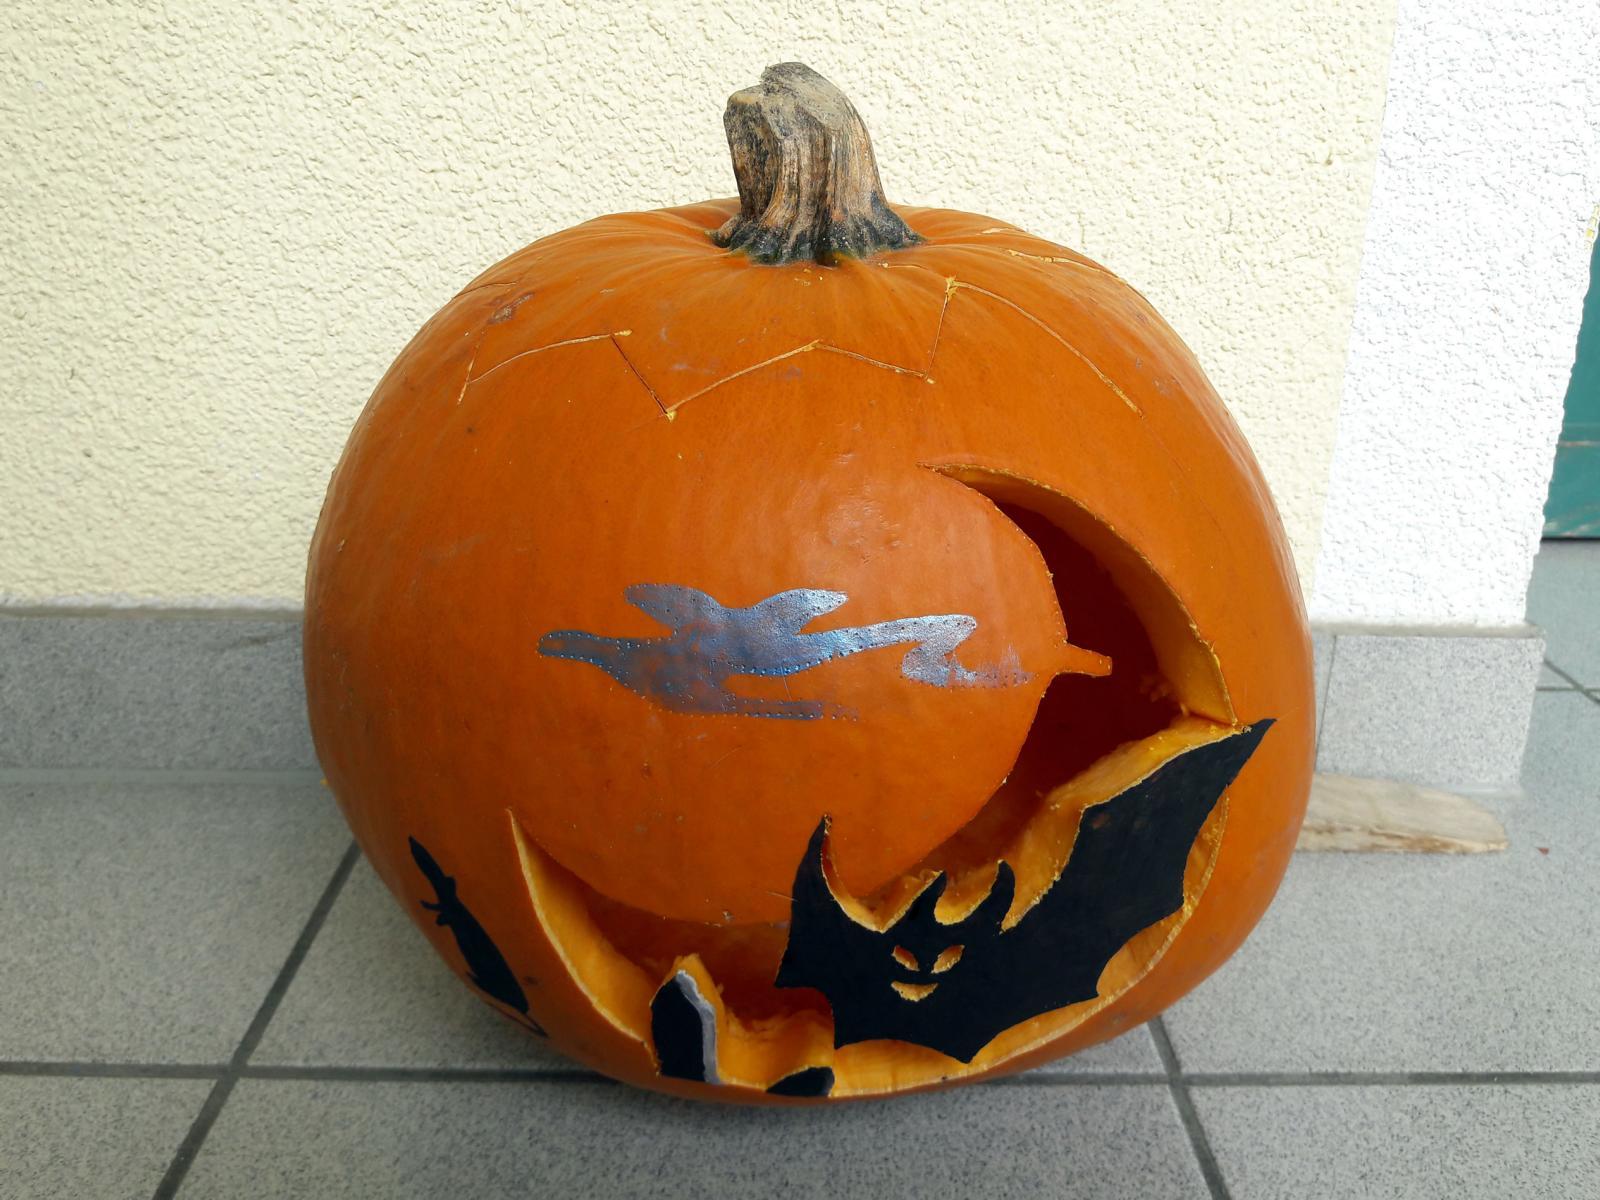 Halloween Kürbisse Gestalten Mit Kindern Schnitzen Bemalen Bekleben